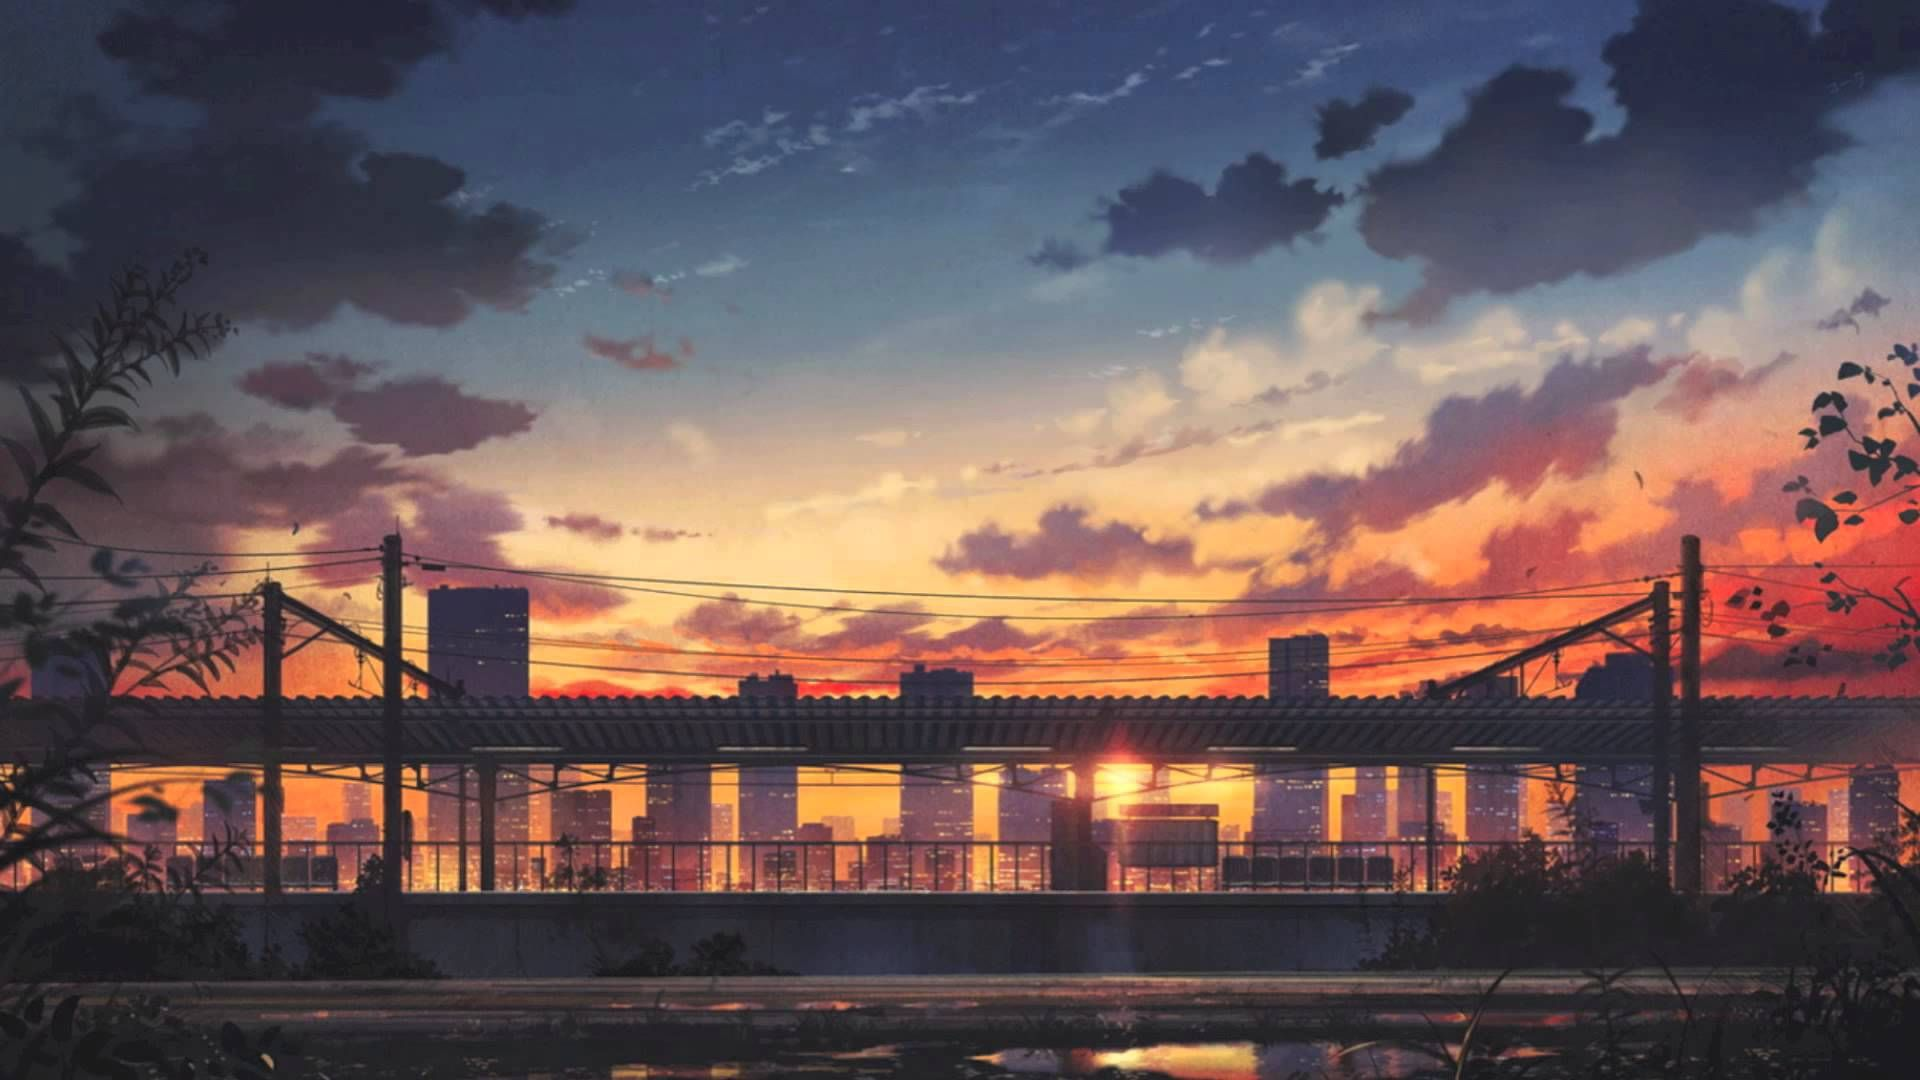 Explore More Wallpapers Anime Wallpaper Aesthetic Aesthetic Wallpaper Anime Aesthetic Background Anime wallpaper city sunset